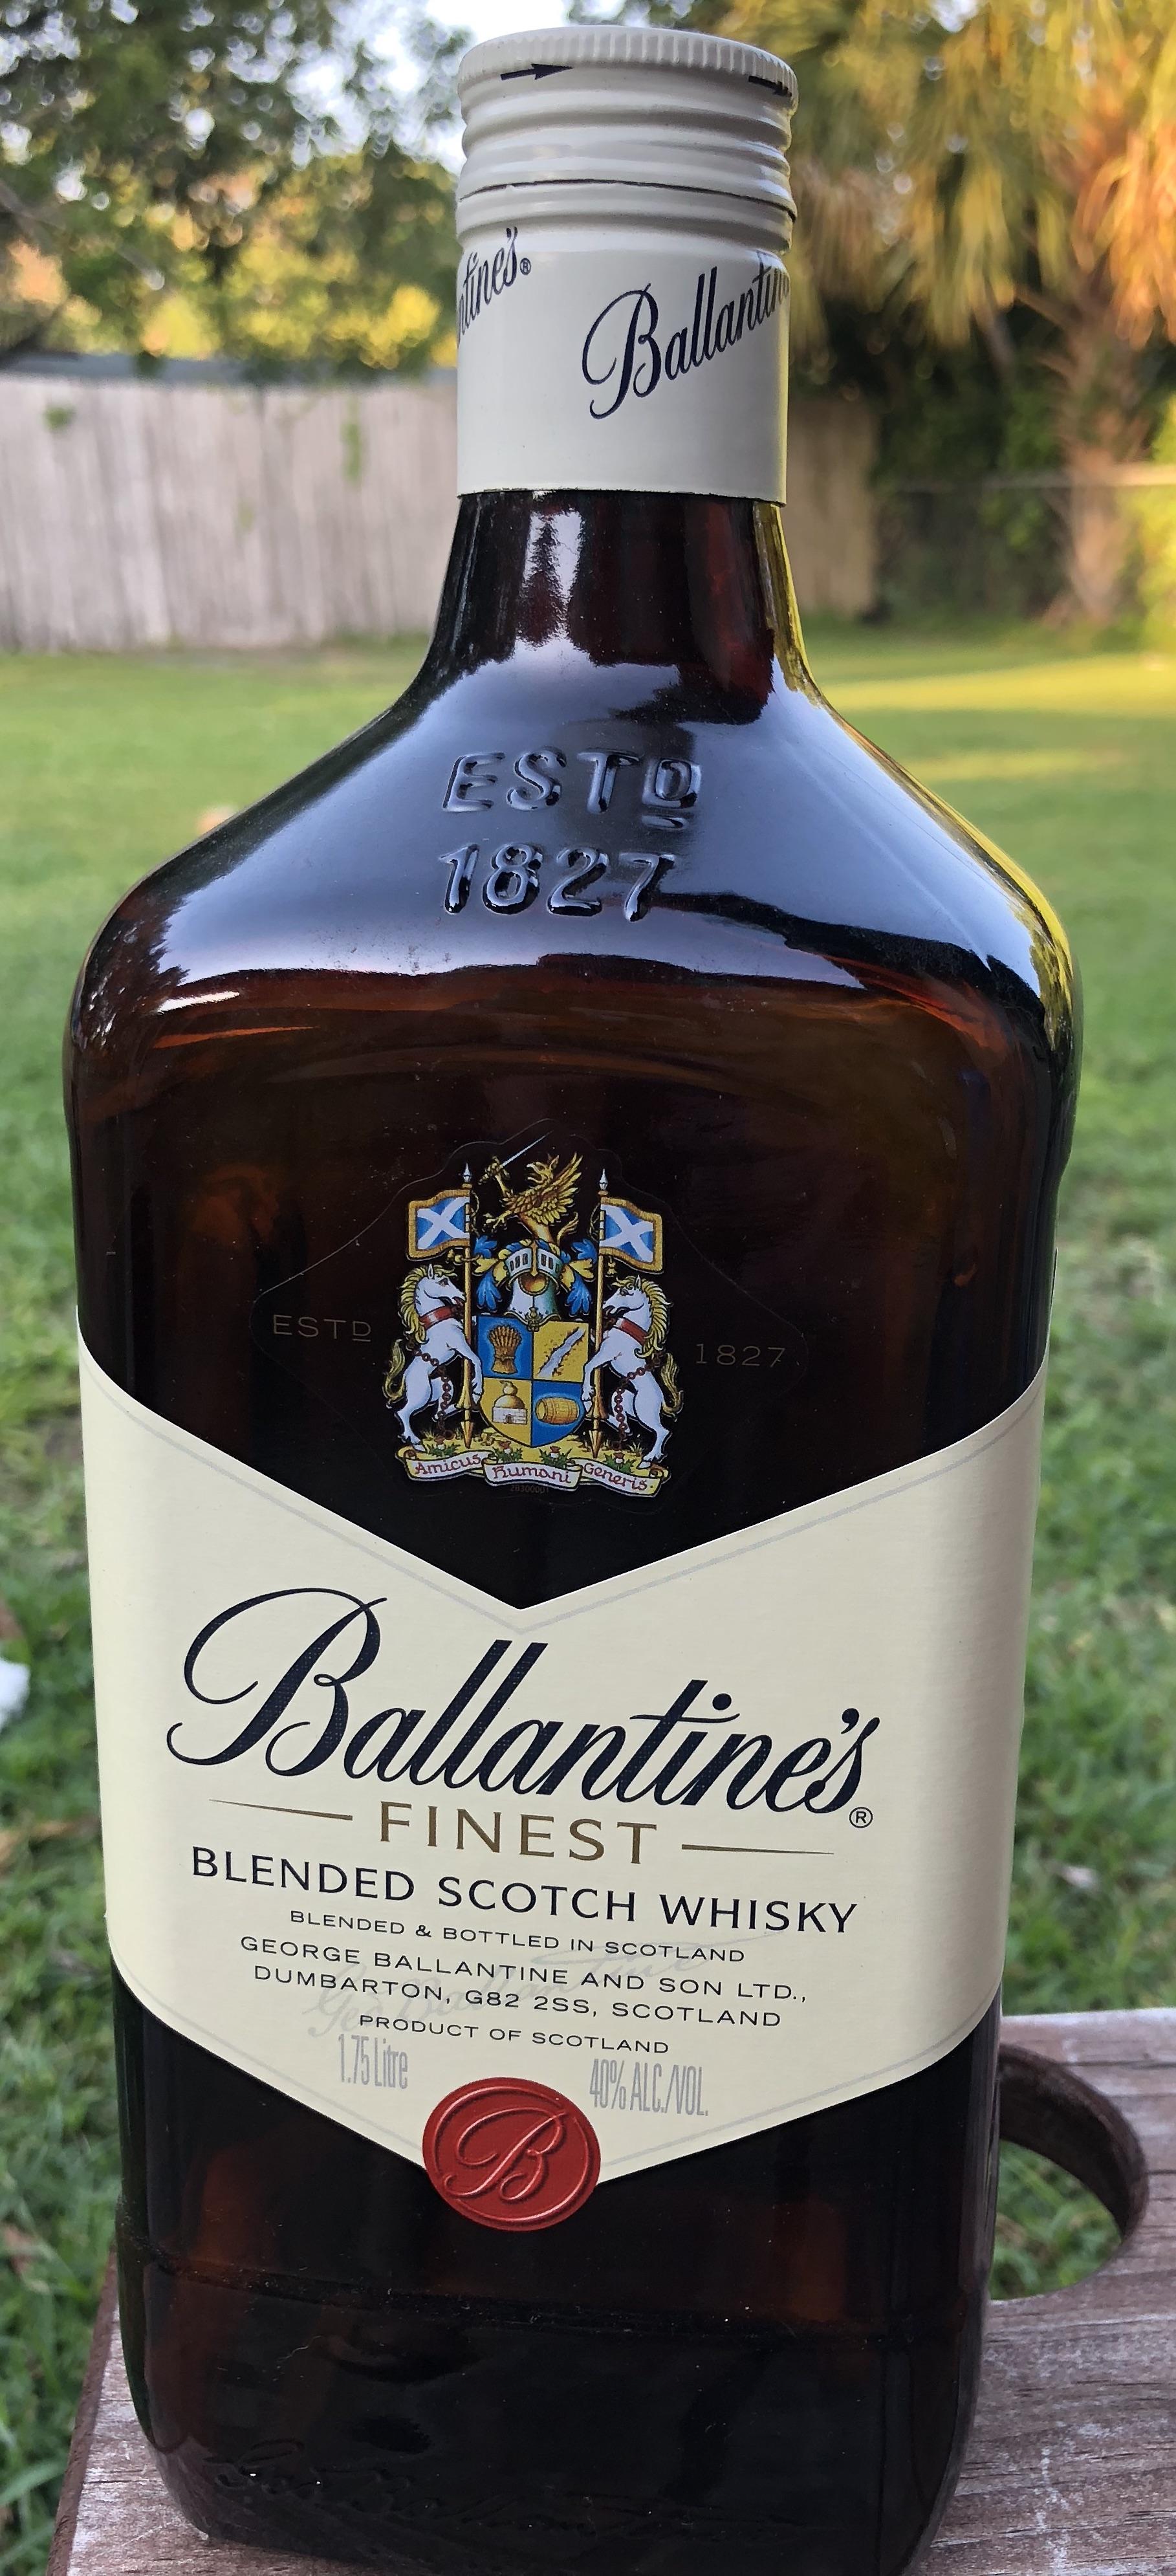 Ballantines.jpg